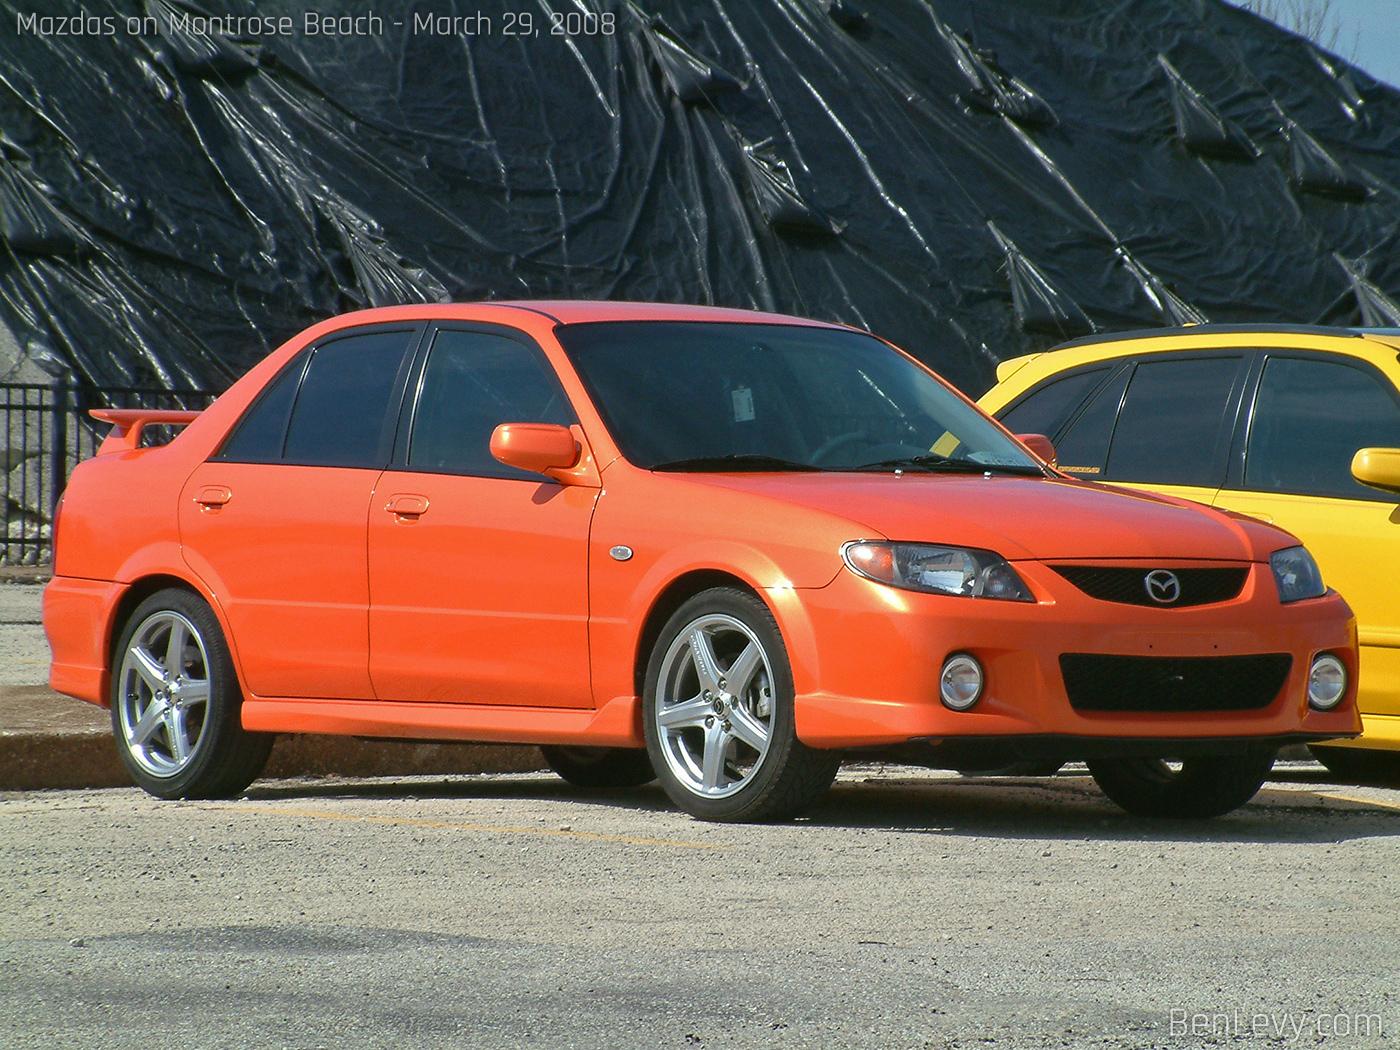 Motor Mazda Mazdaspeed Protege Tuning Car Pictures